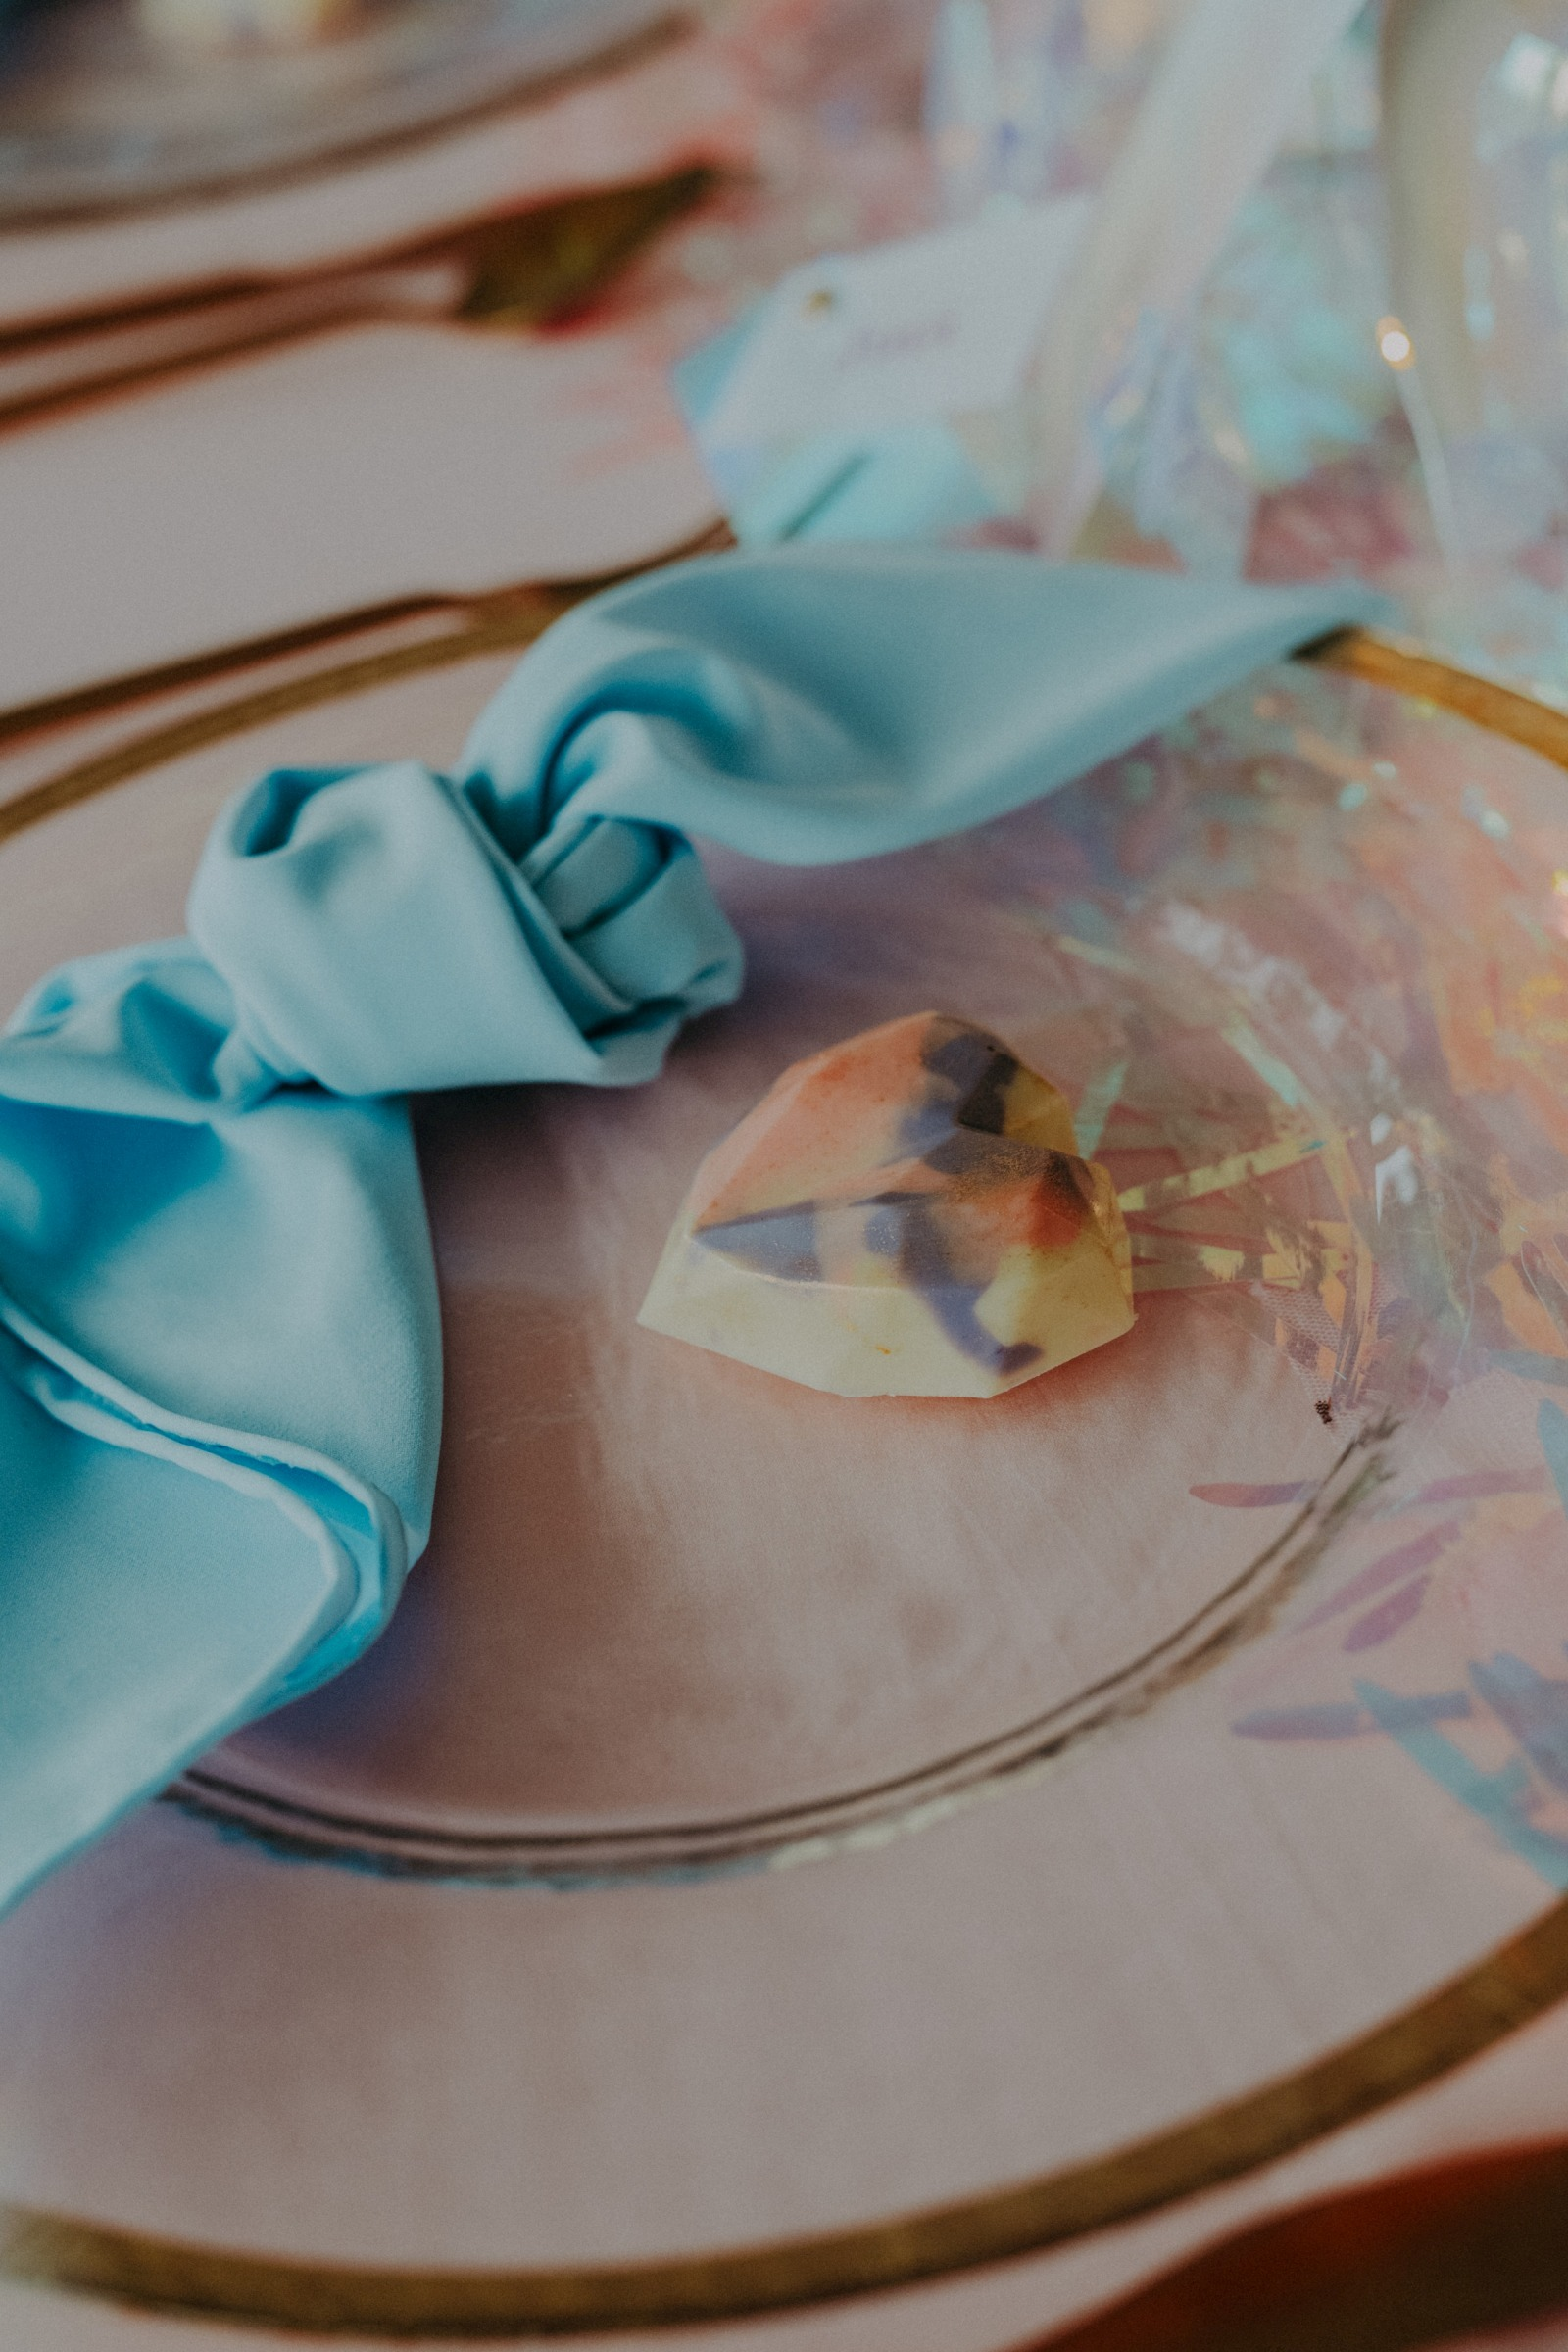 colourful pastel wedding - unconventional wedding - alternative wedding - unique wedding napkins - unique wedding favours